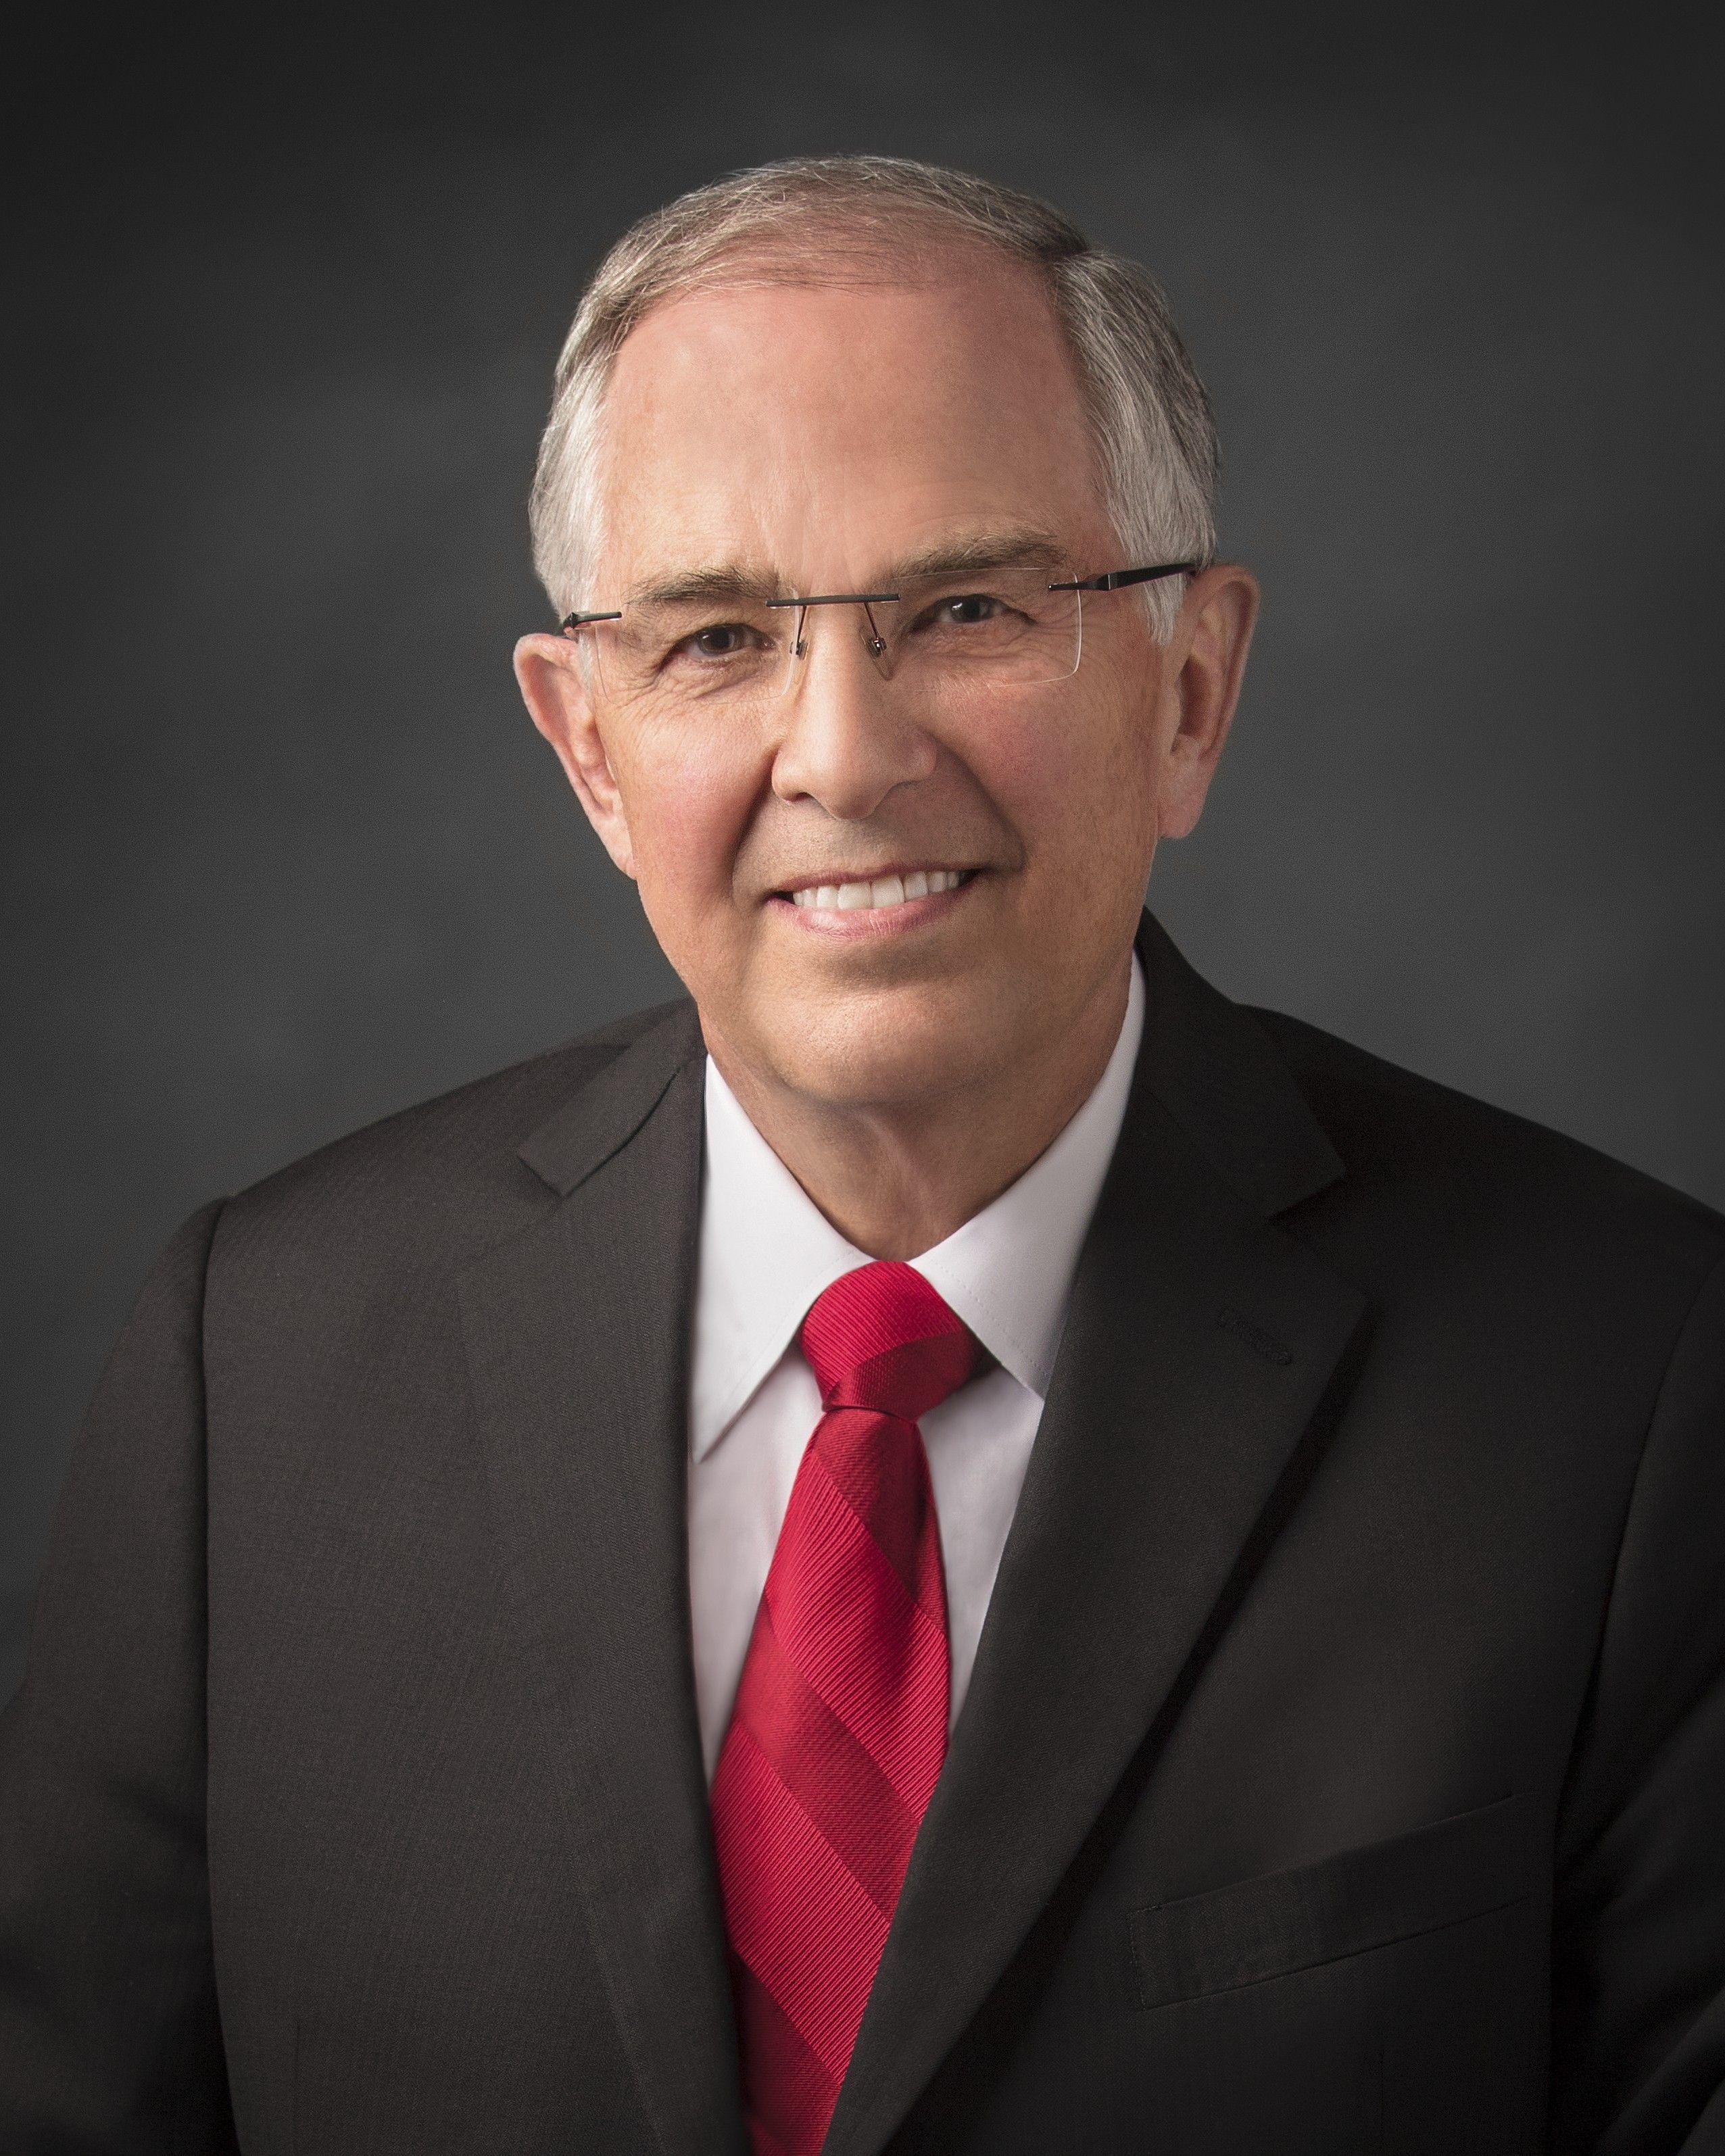 Elder Neil L. Andersen, official portrait, 2019.